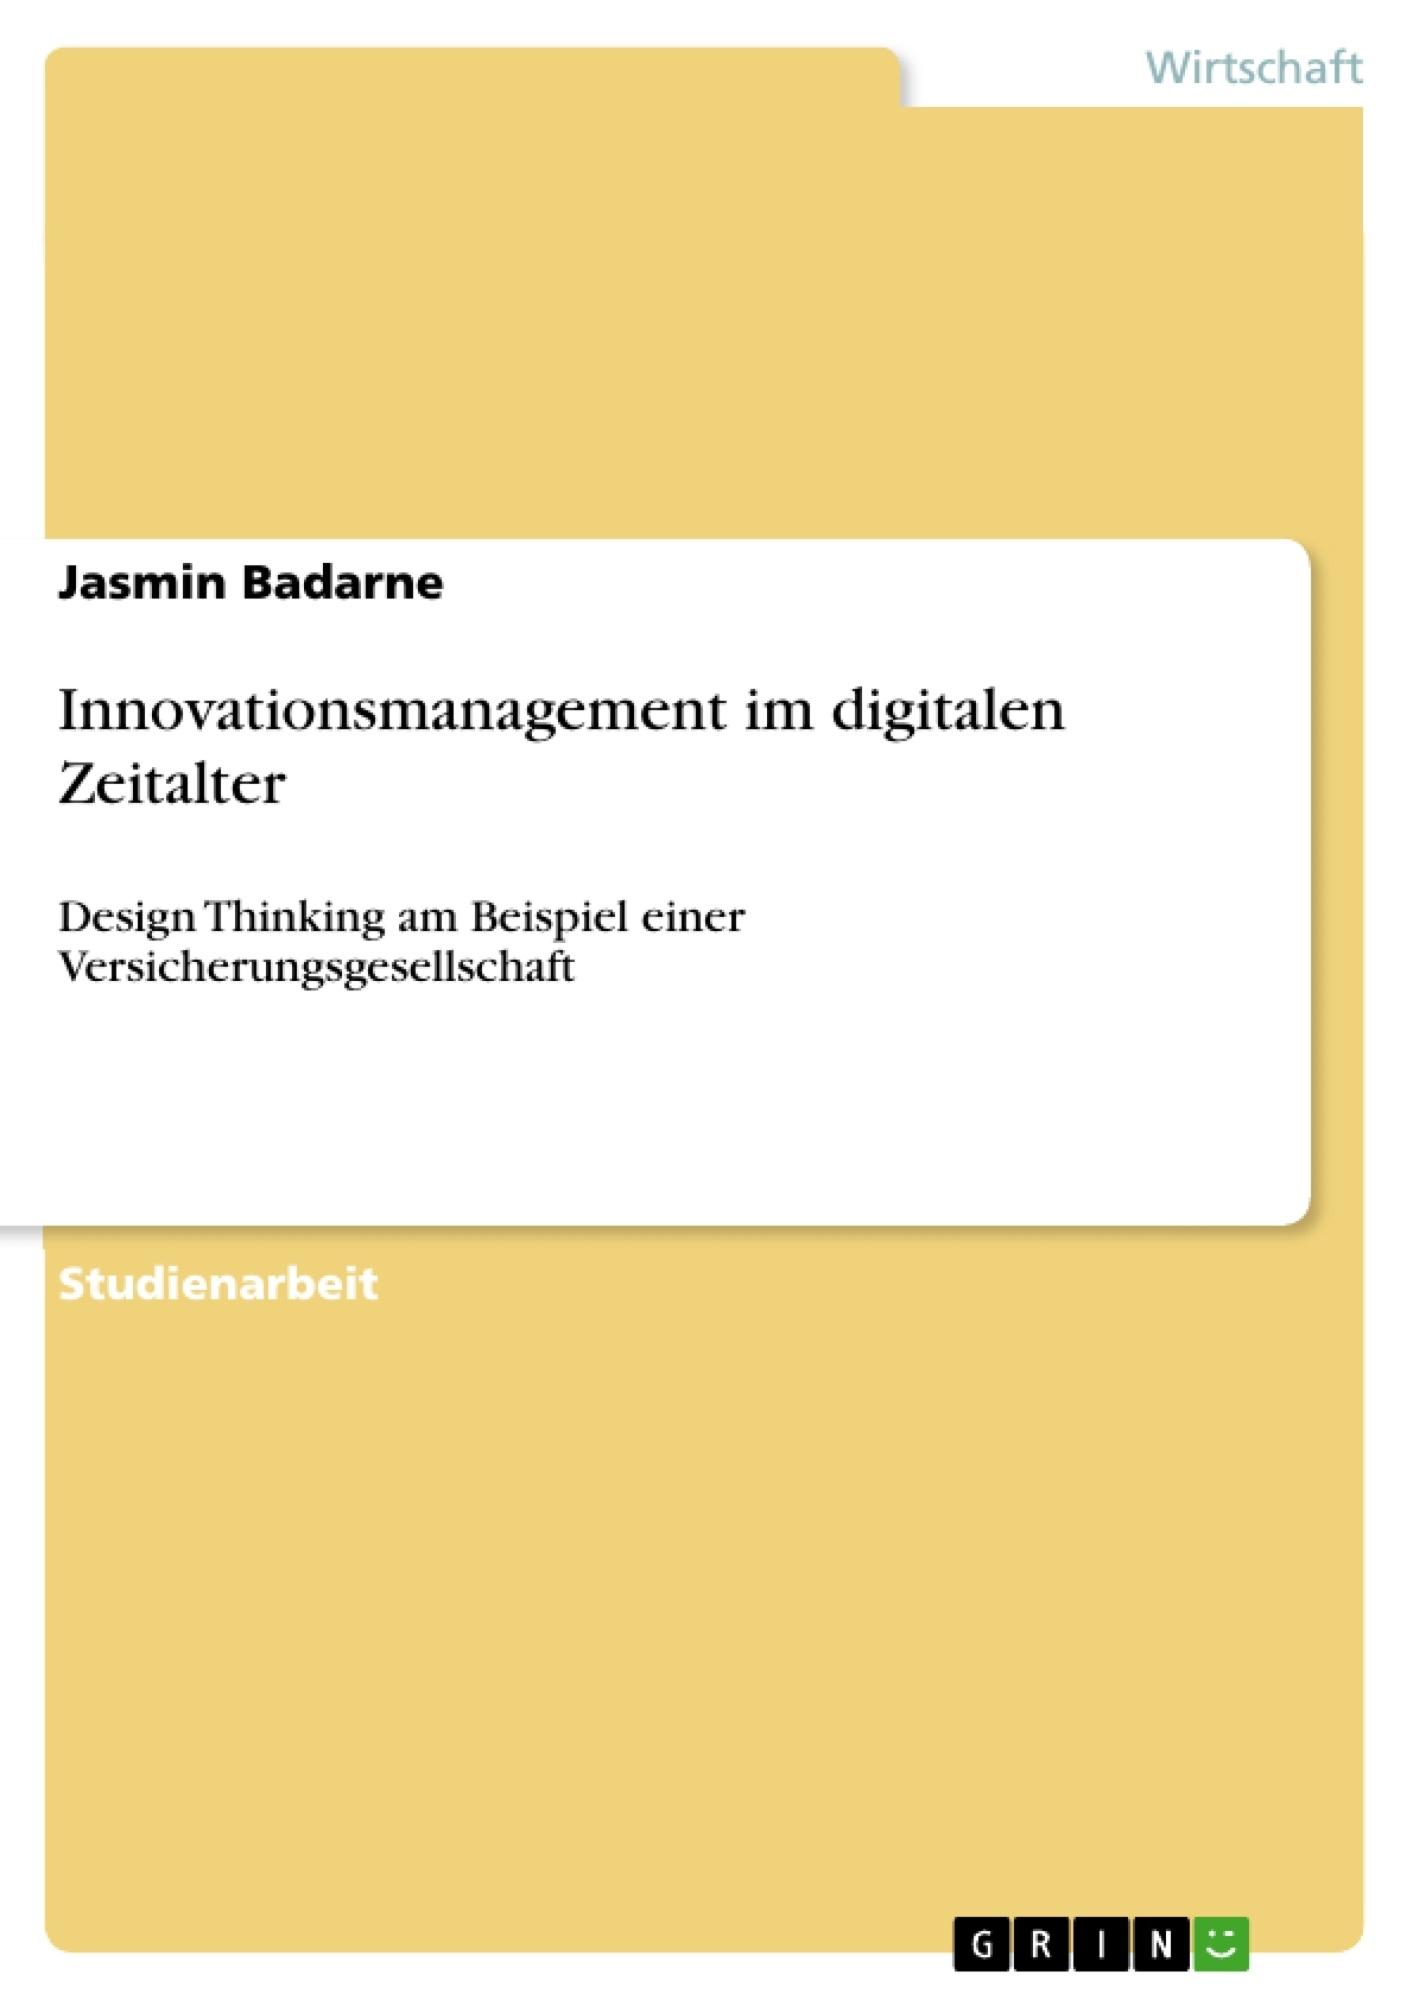 Titel: Innovationsmanagement im digitalen Zeitalter